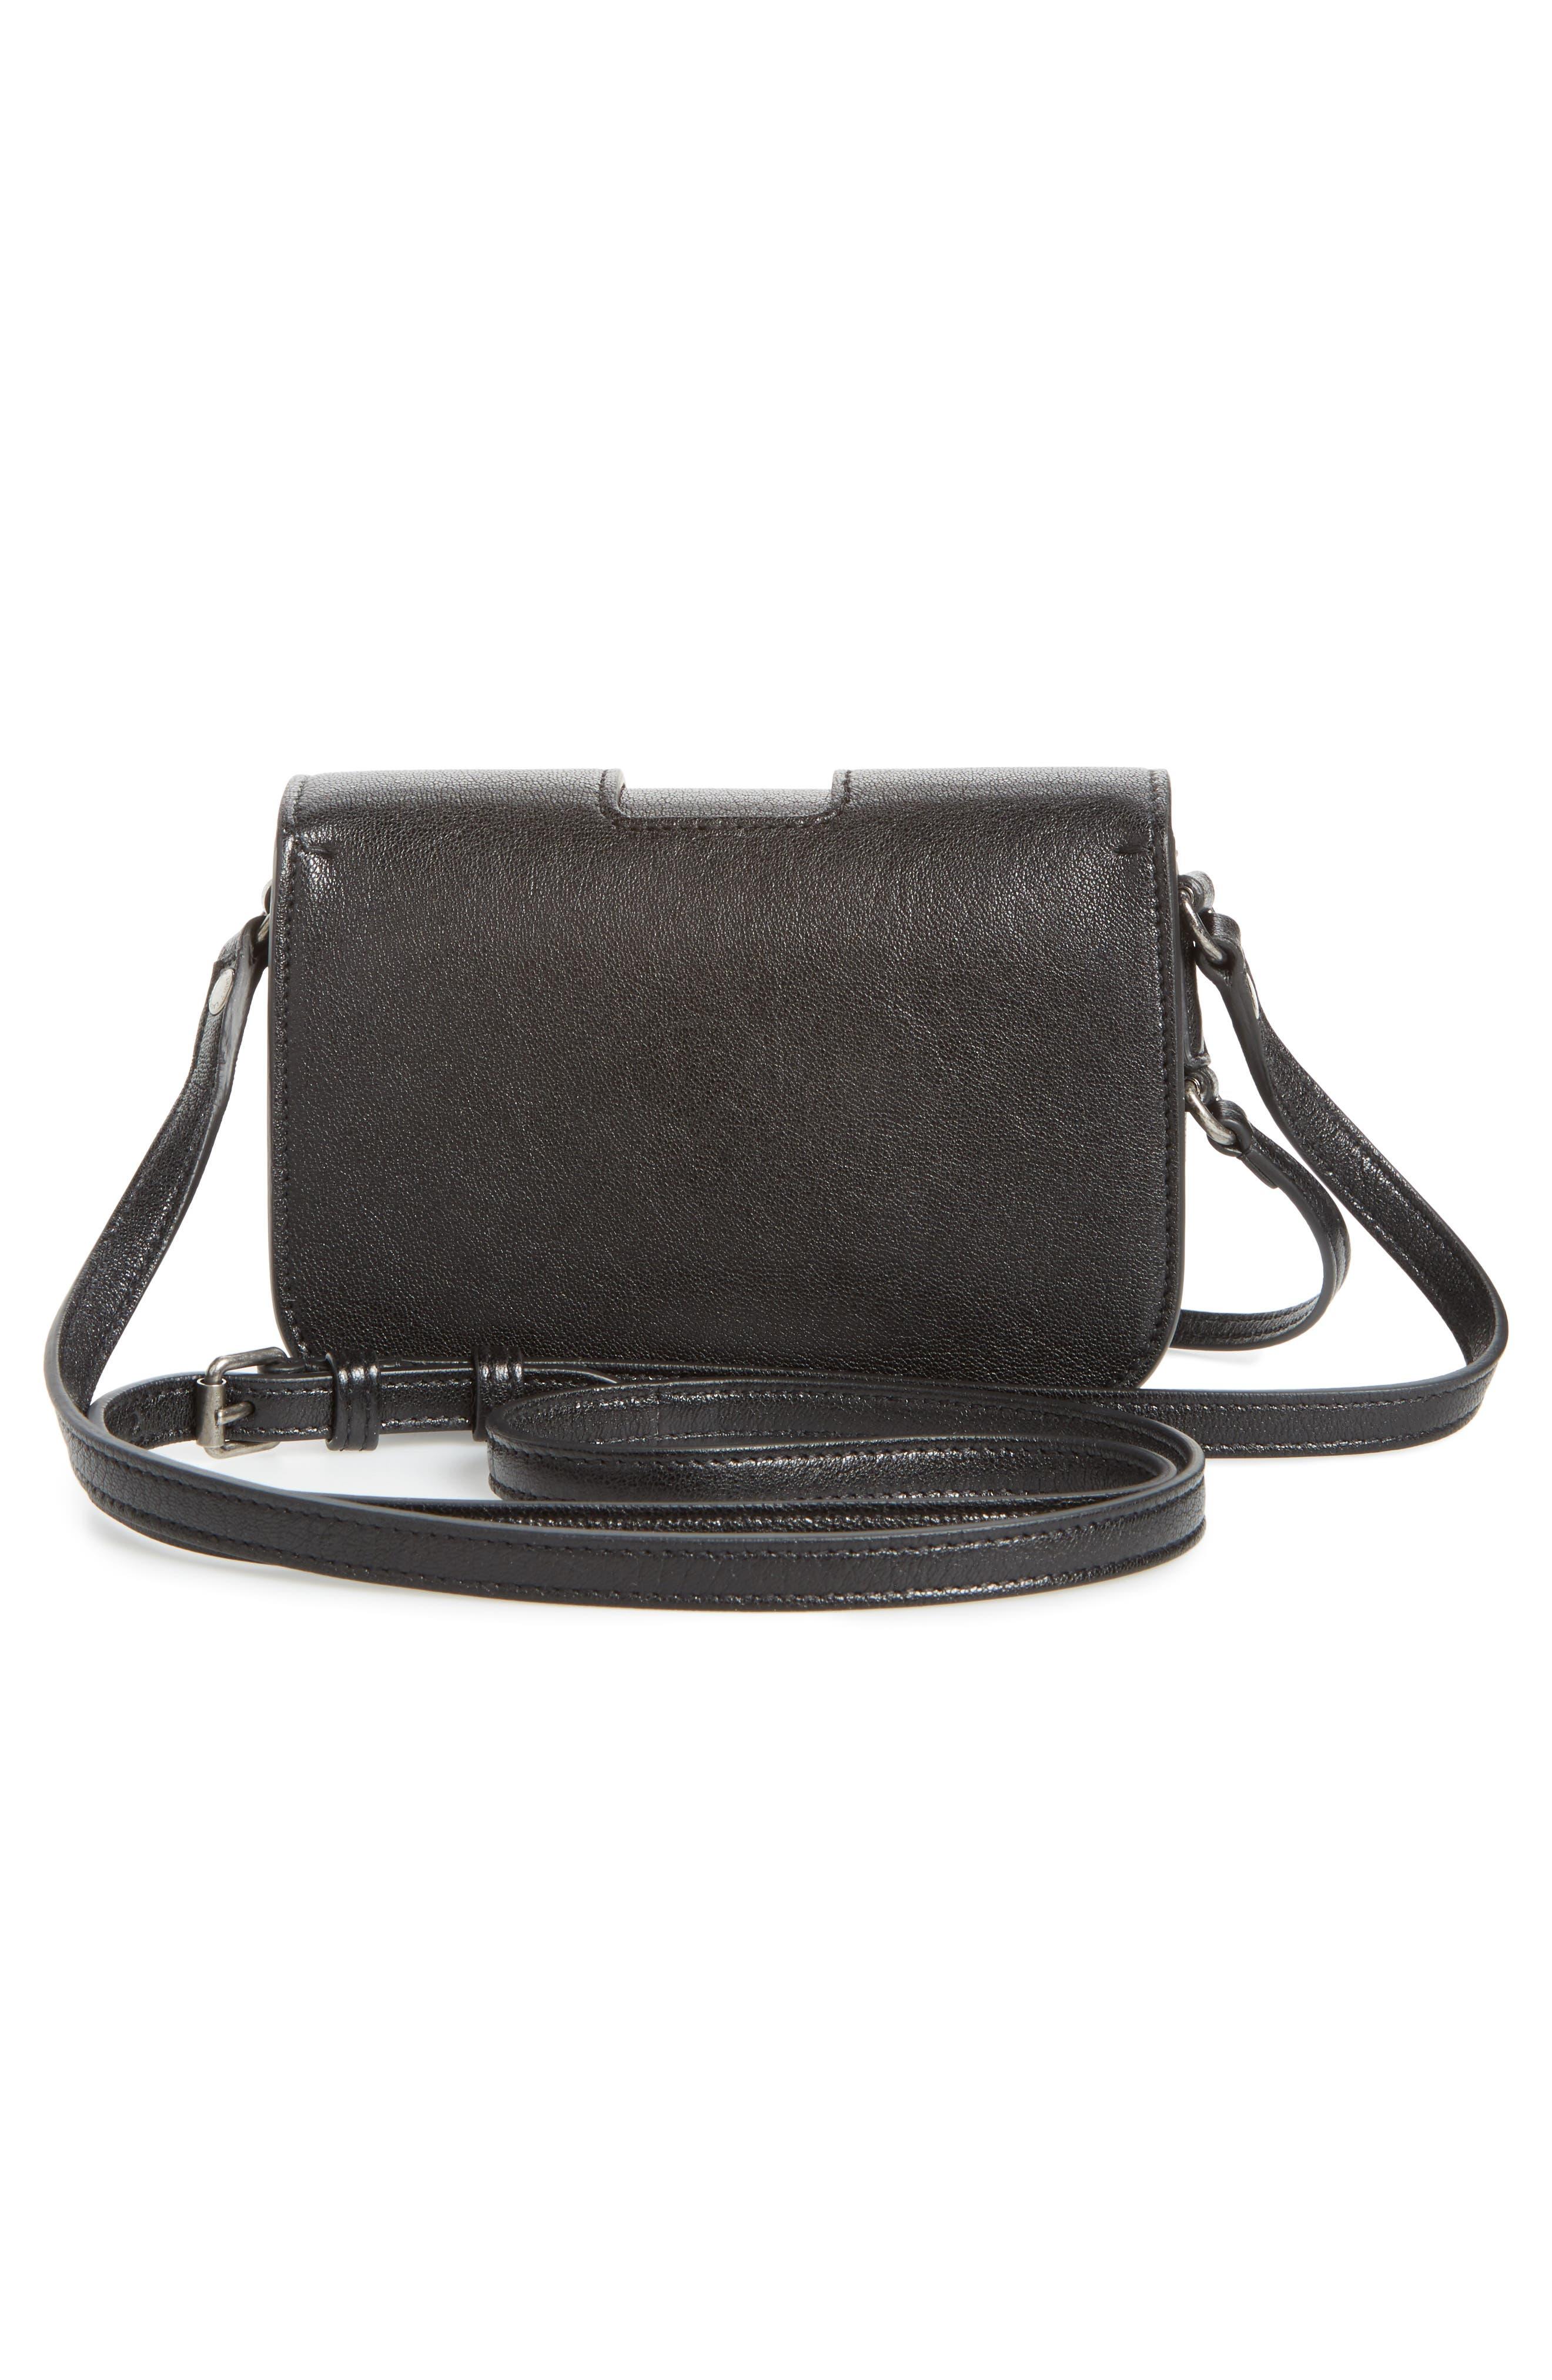 Calfskin Leather Crossbody Bag,                             Alternate thumbnail 3, color,                             001